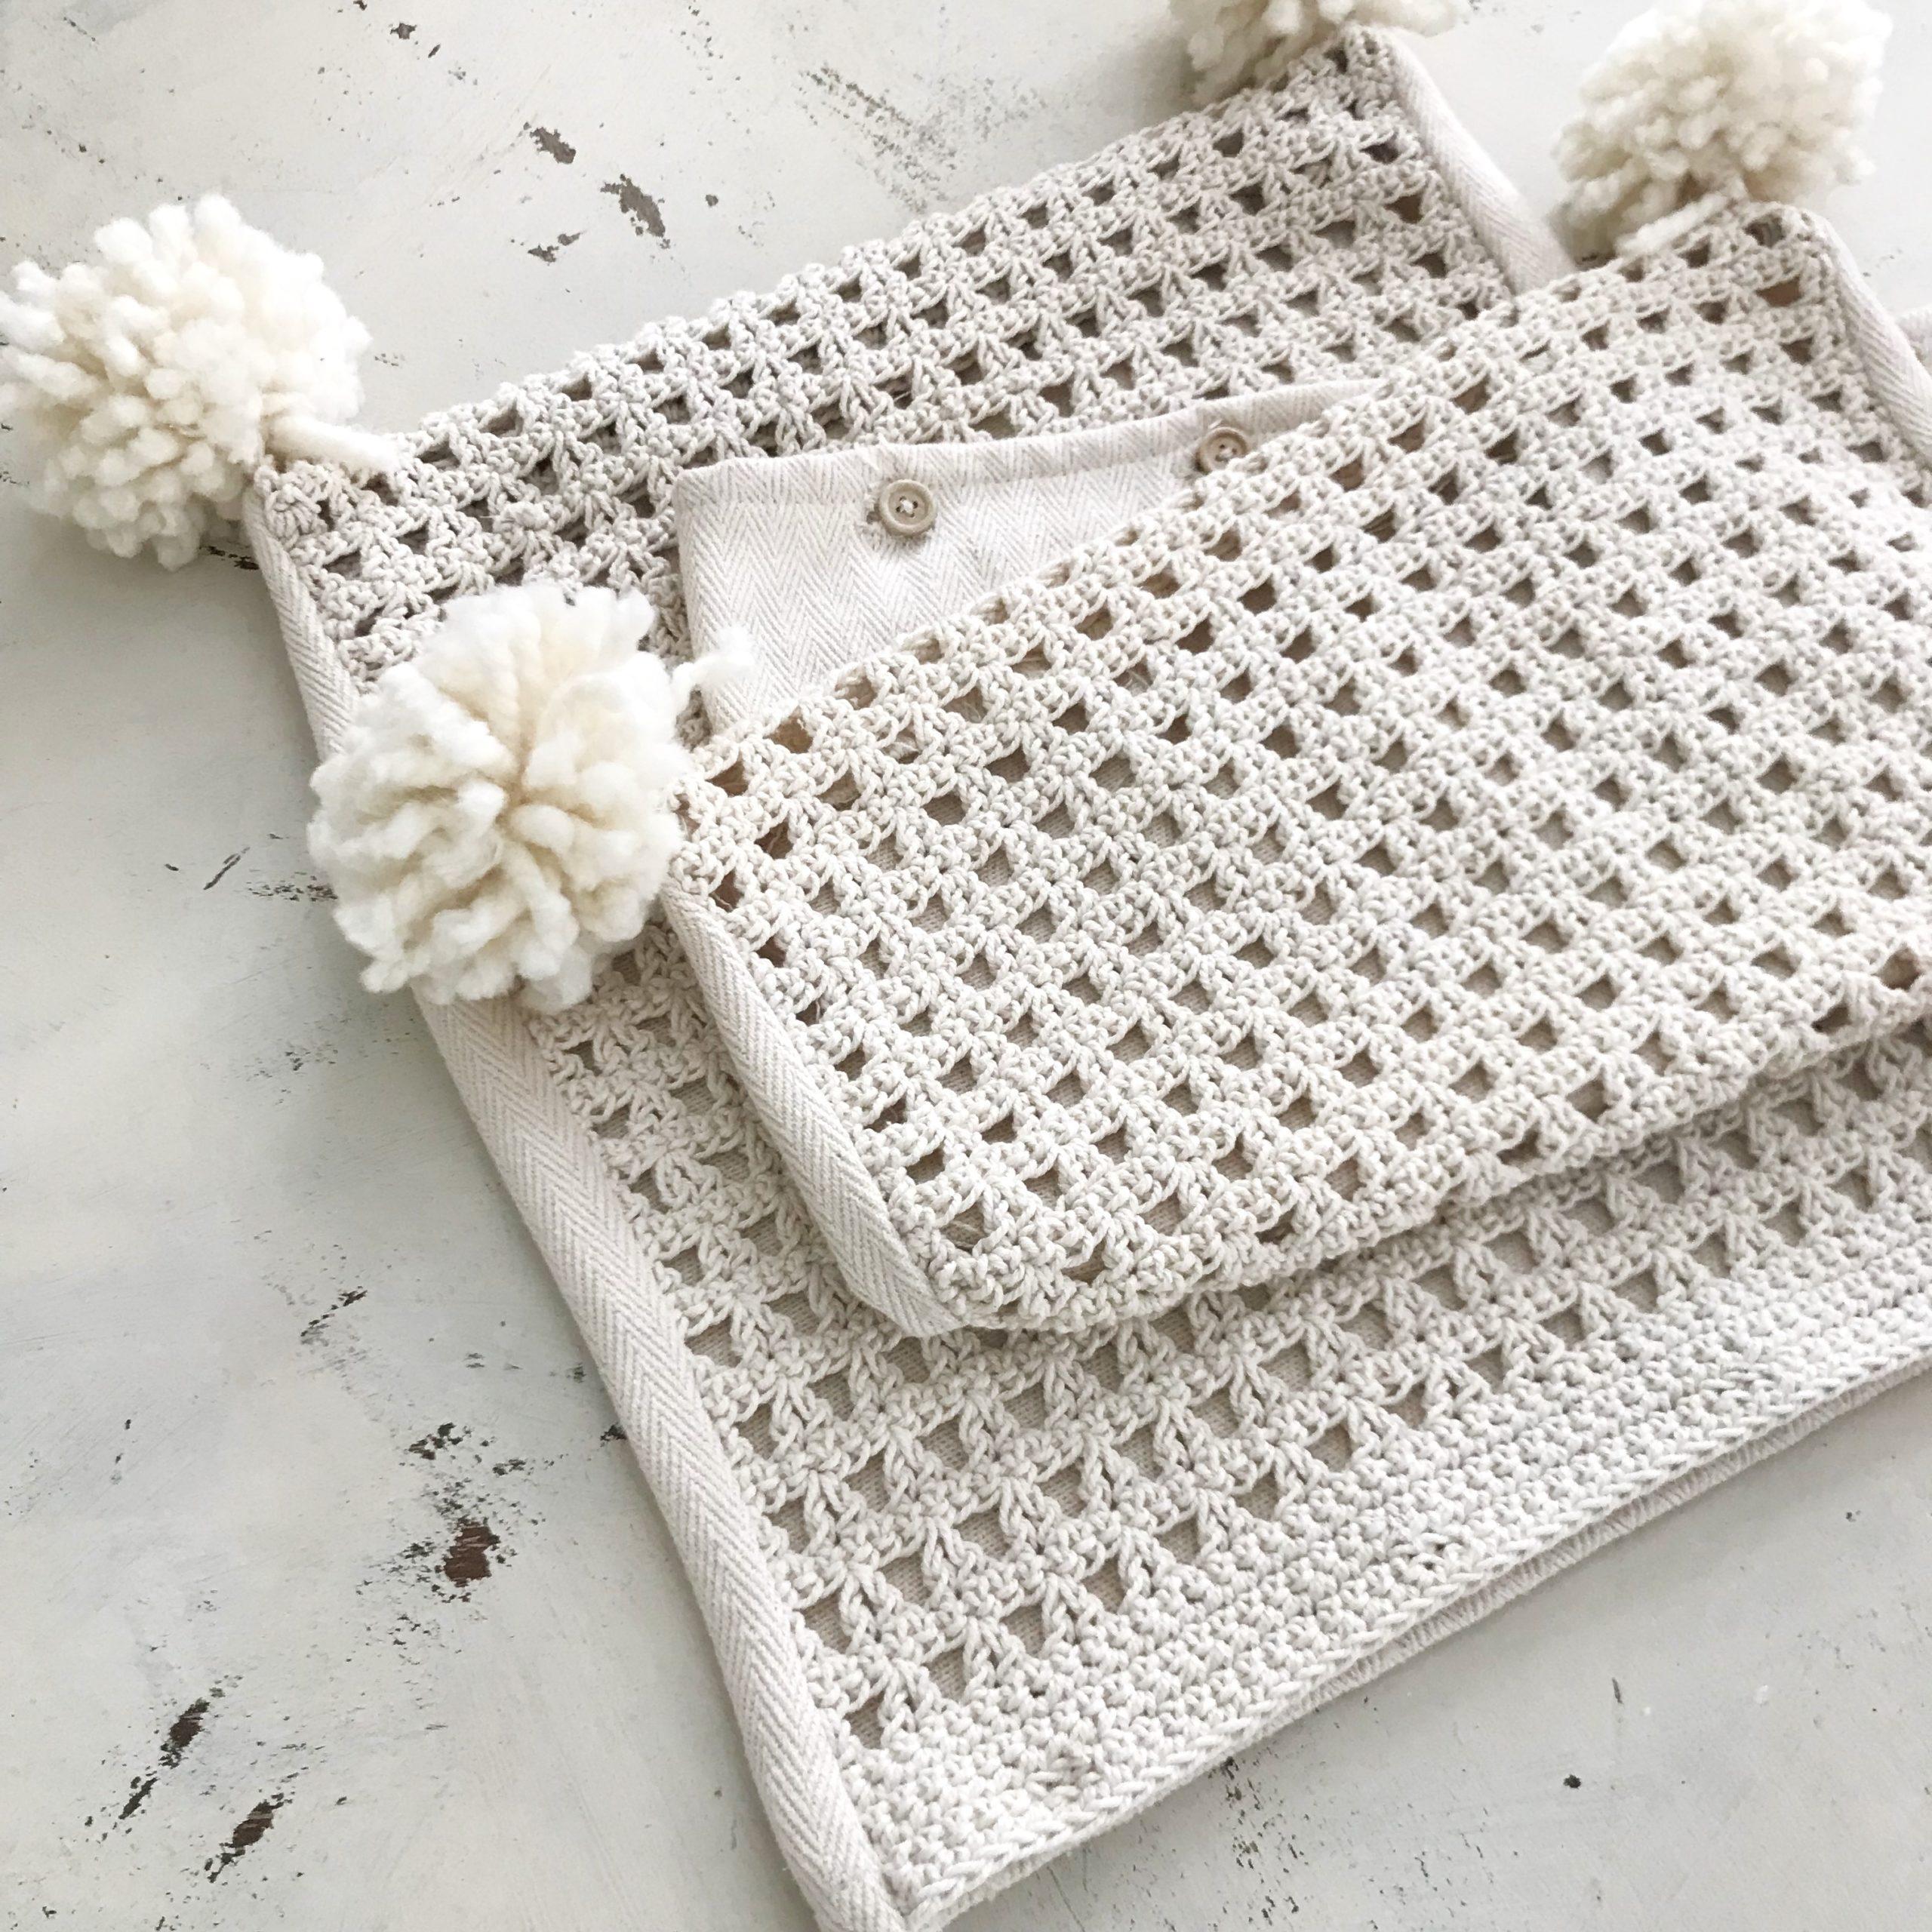 Wool Pom Pom Tutorial for Crafts